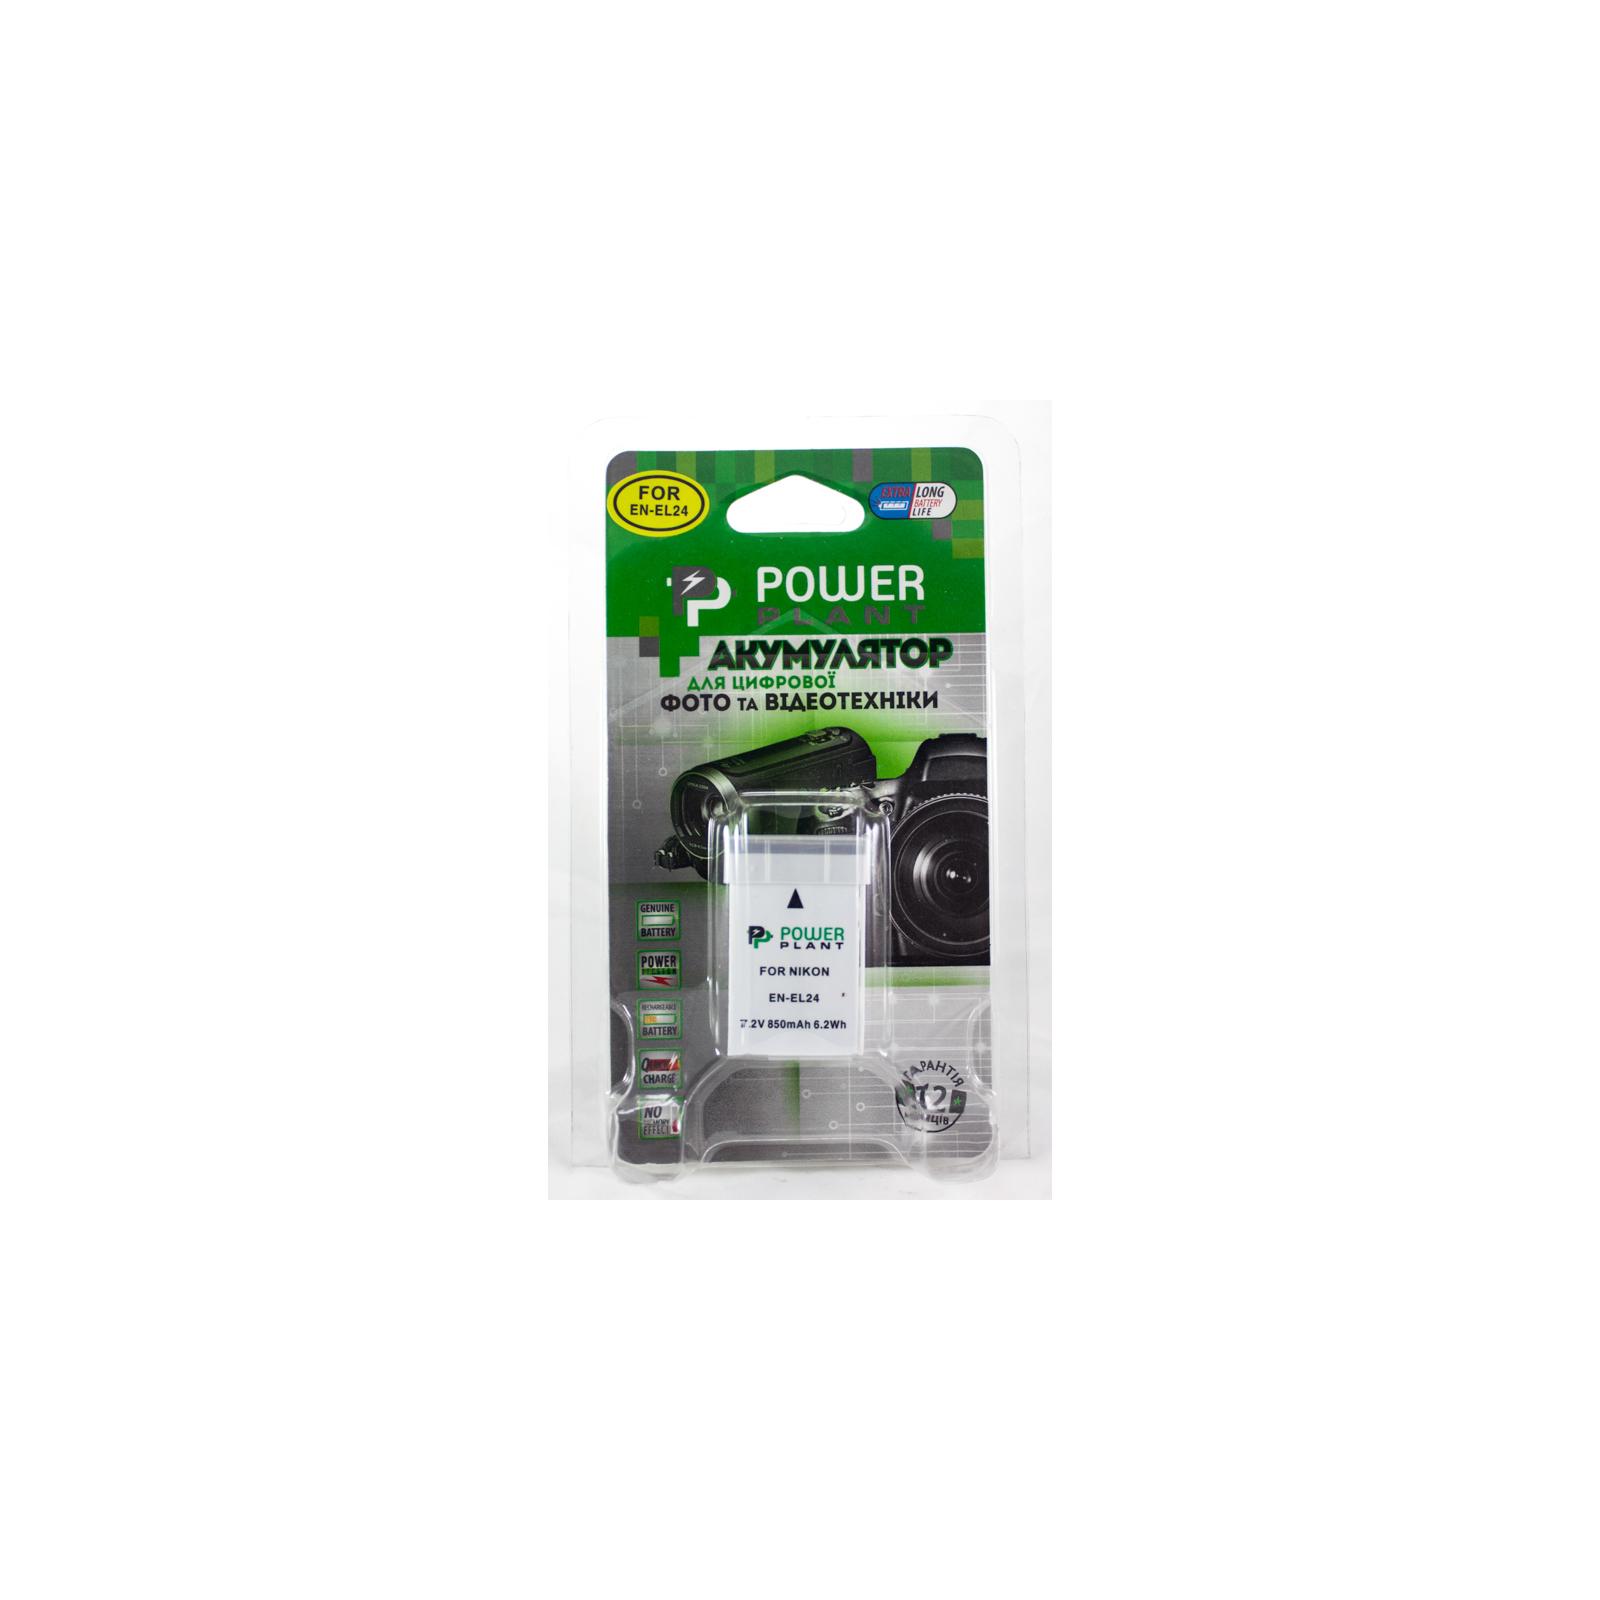 Аккумулятор к фото/видео PowerPlant Nikon EN-EL24 (DV00DV1407) изображение 2